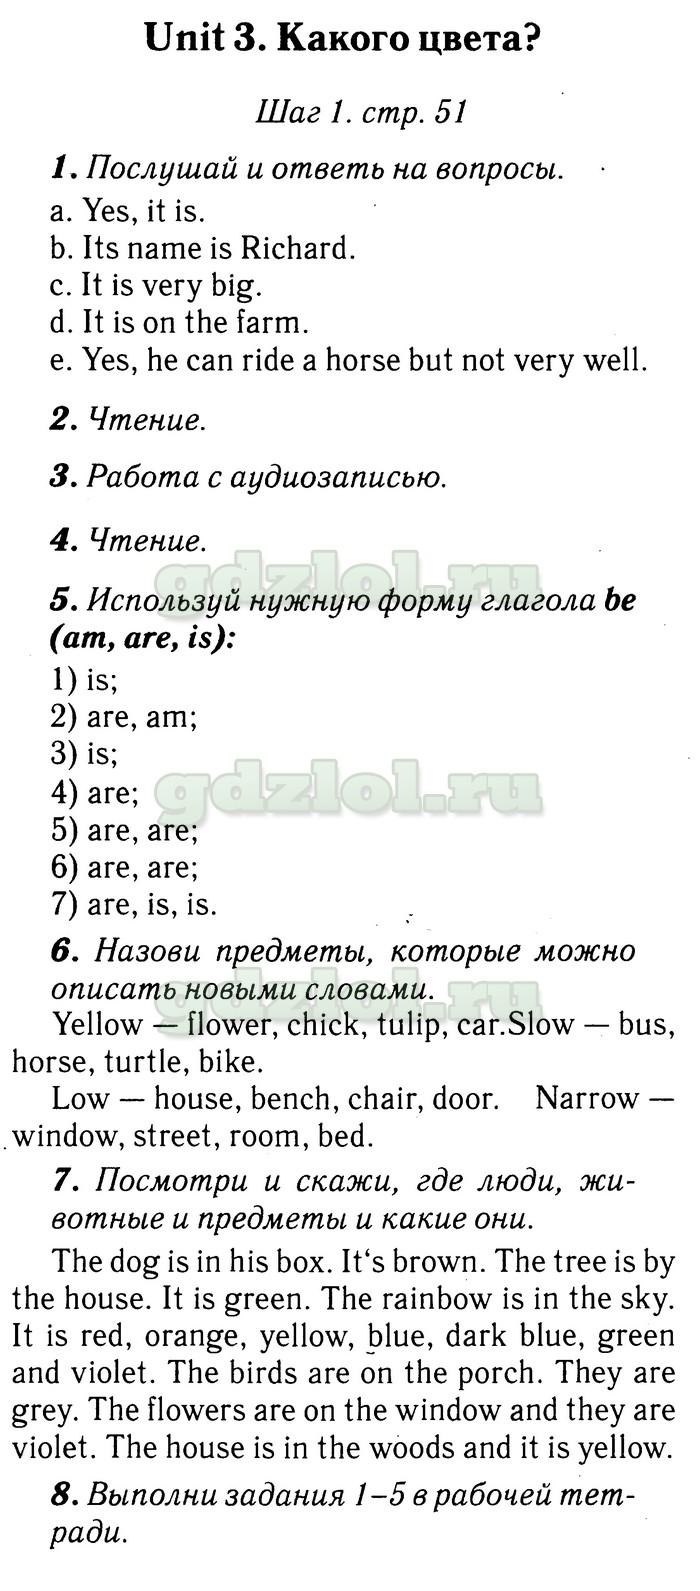 английский язык страница 69 номер 6